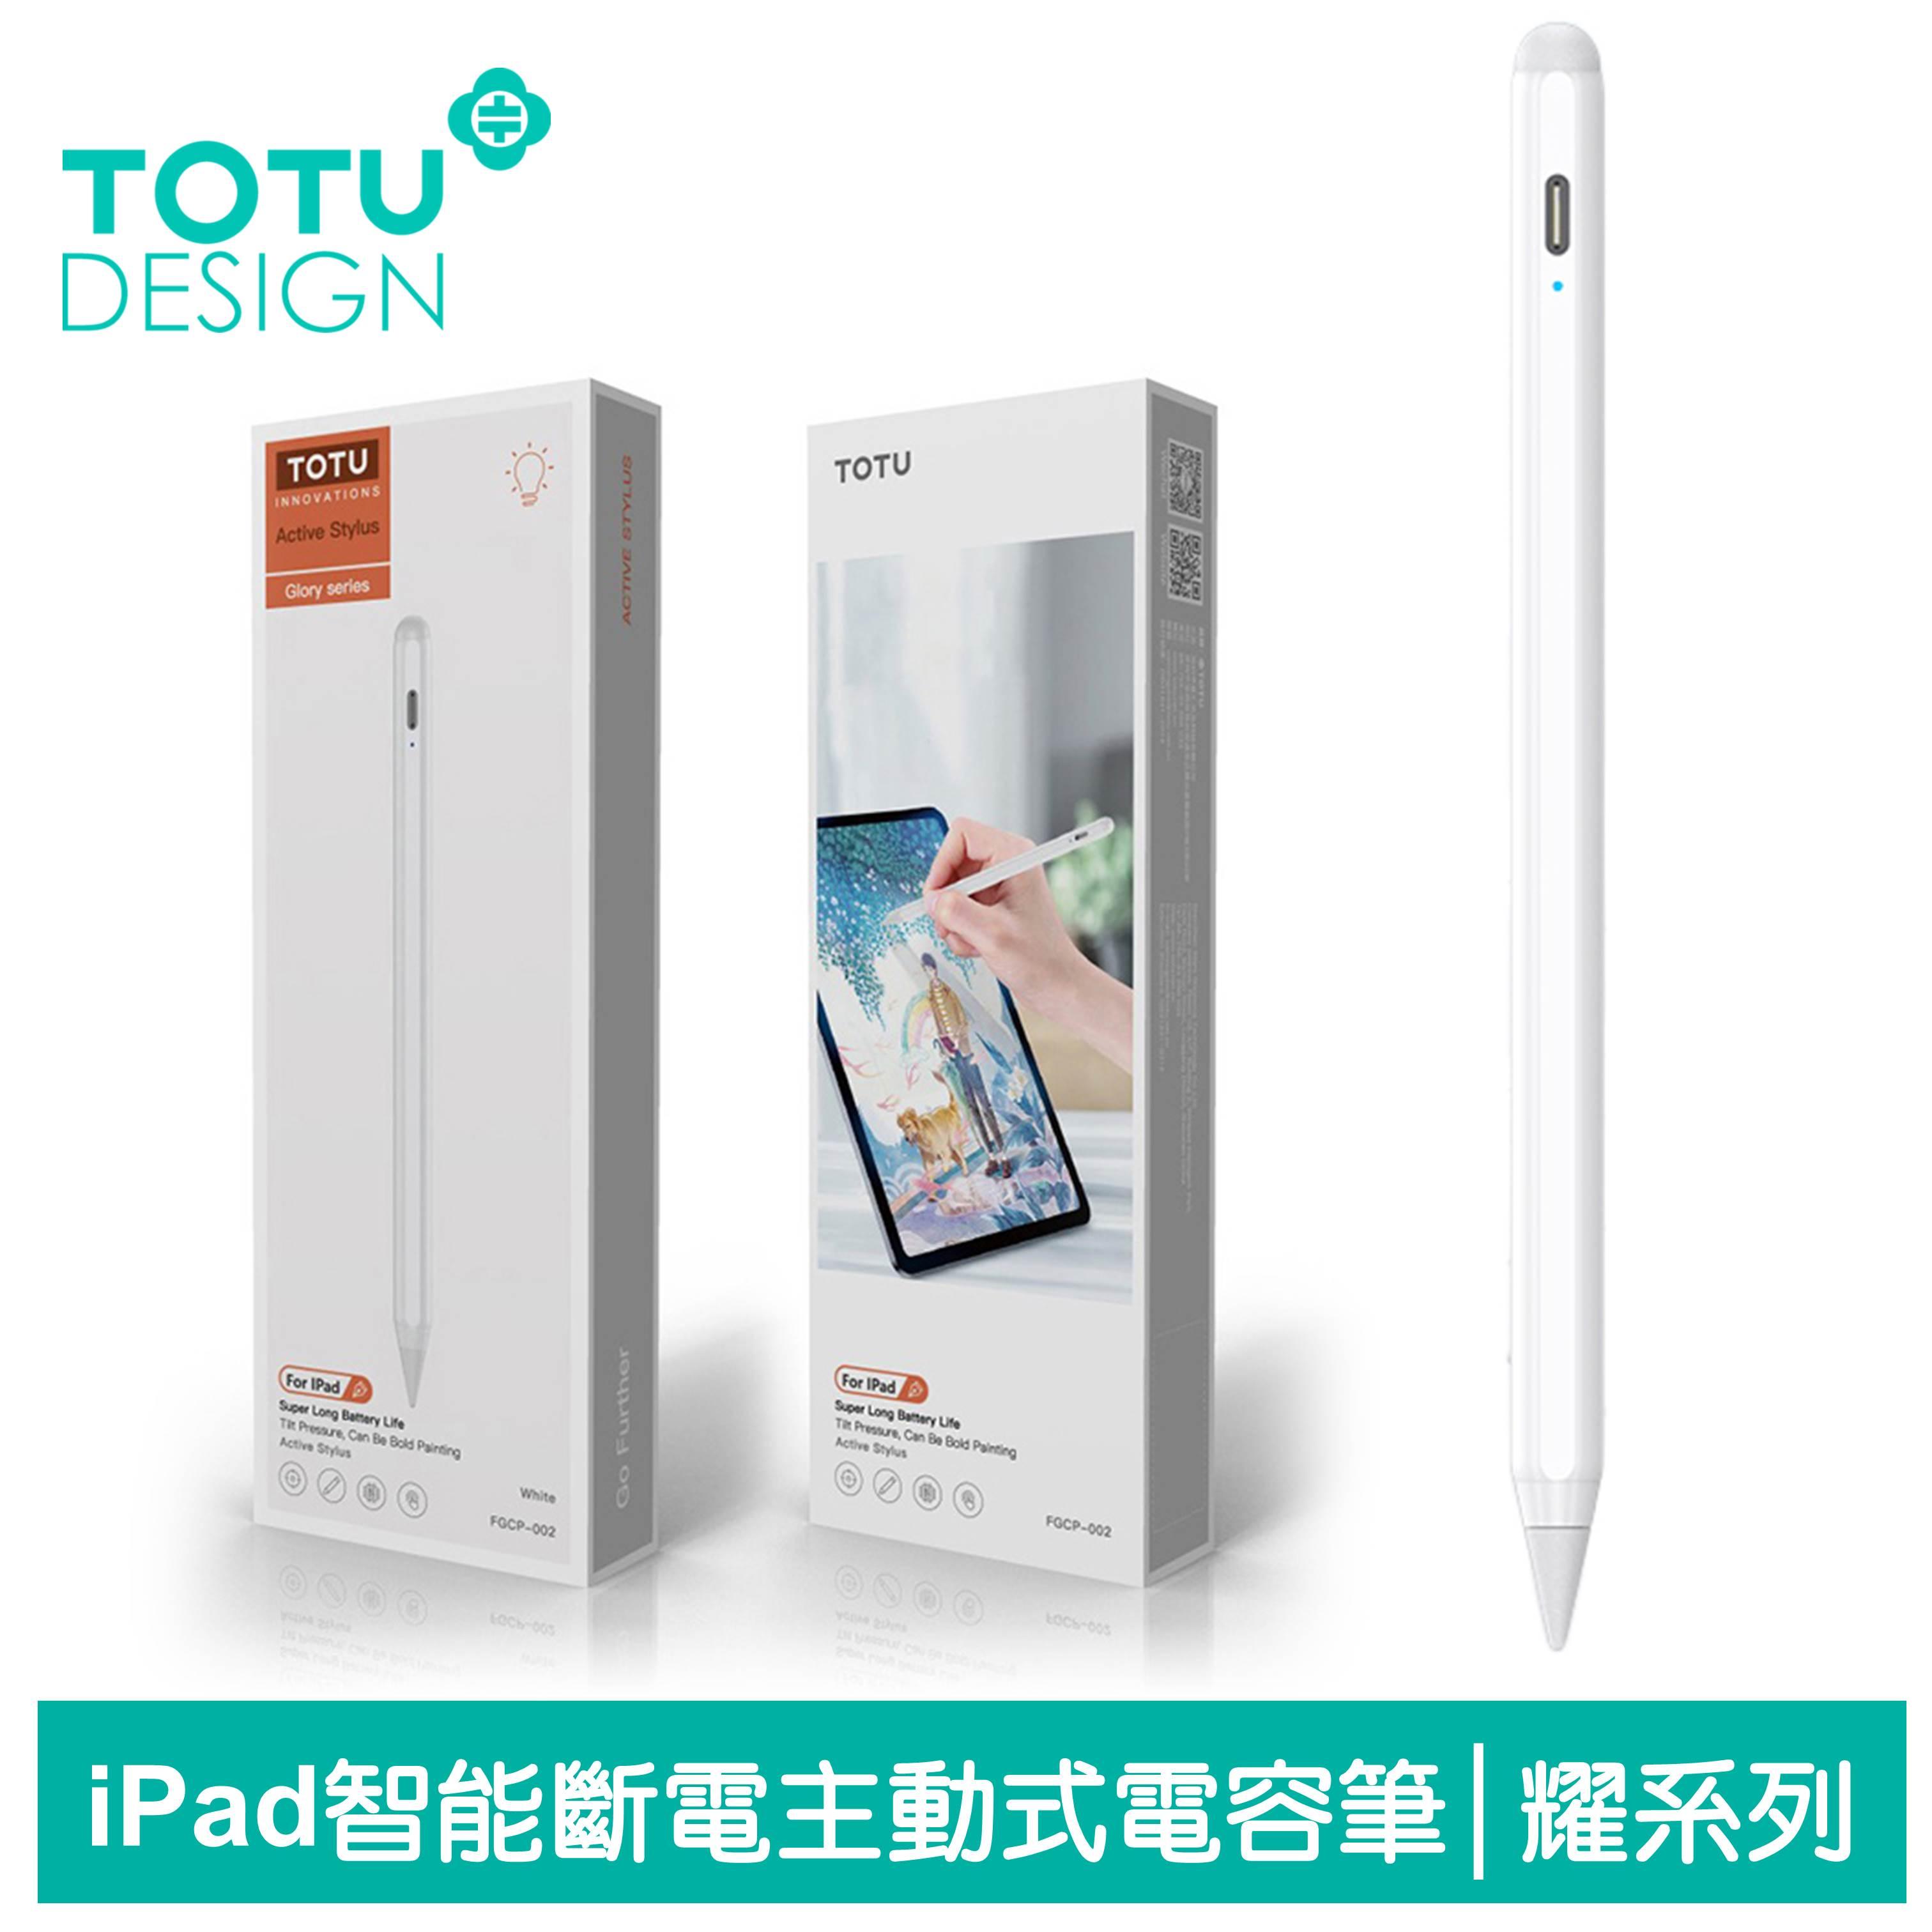 TOTU台灣官方 iPad智能斷電觸控筆主動式電容筆繪圖筆電子筆USB 耀系列